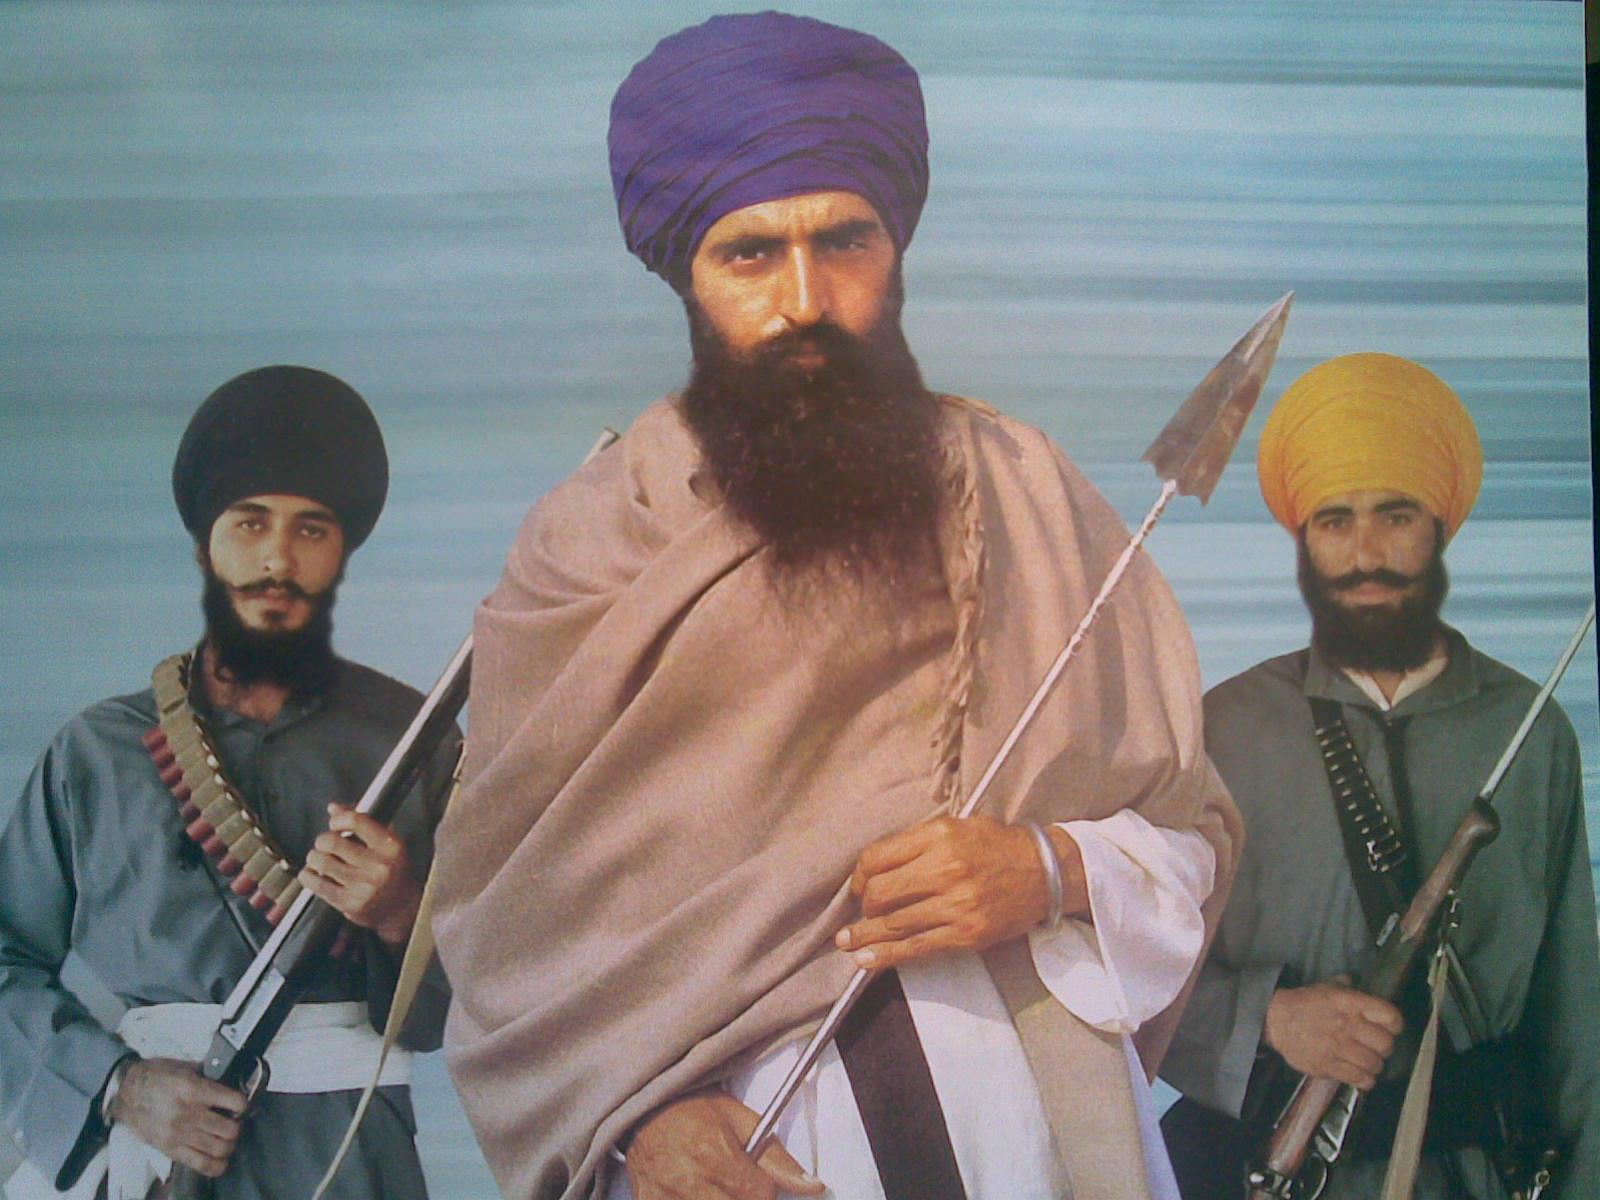 Sant Jarnail Singh Bhindranwale